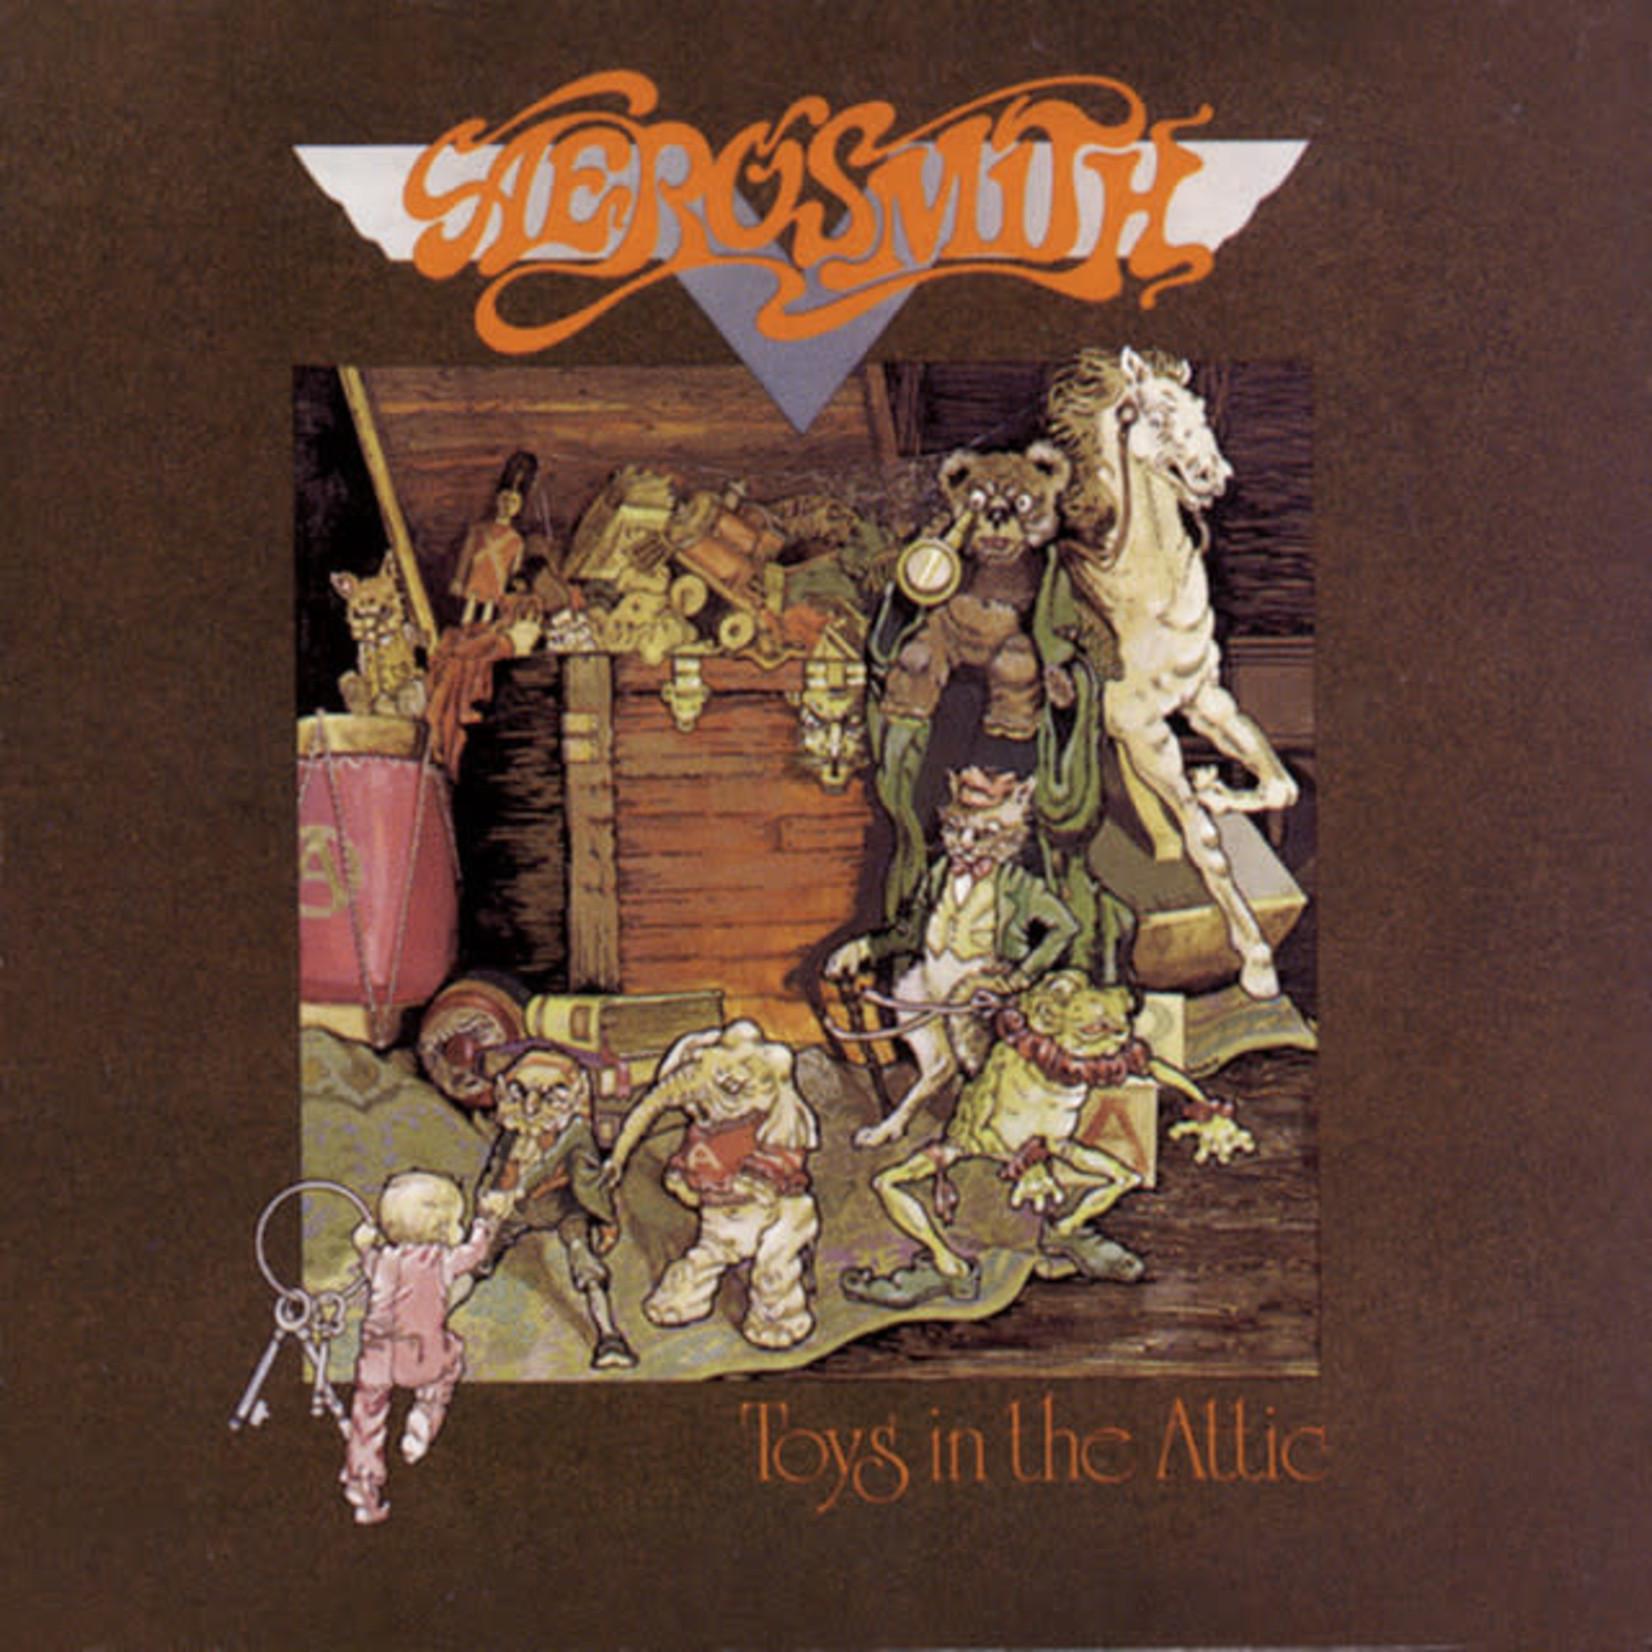 Vinyl Aerosmith - Toys In The Attic